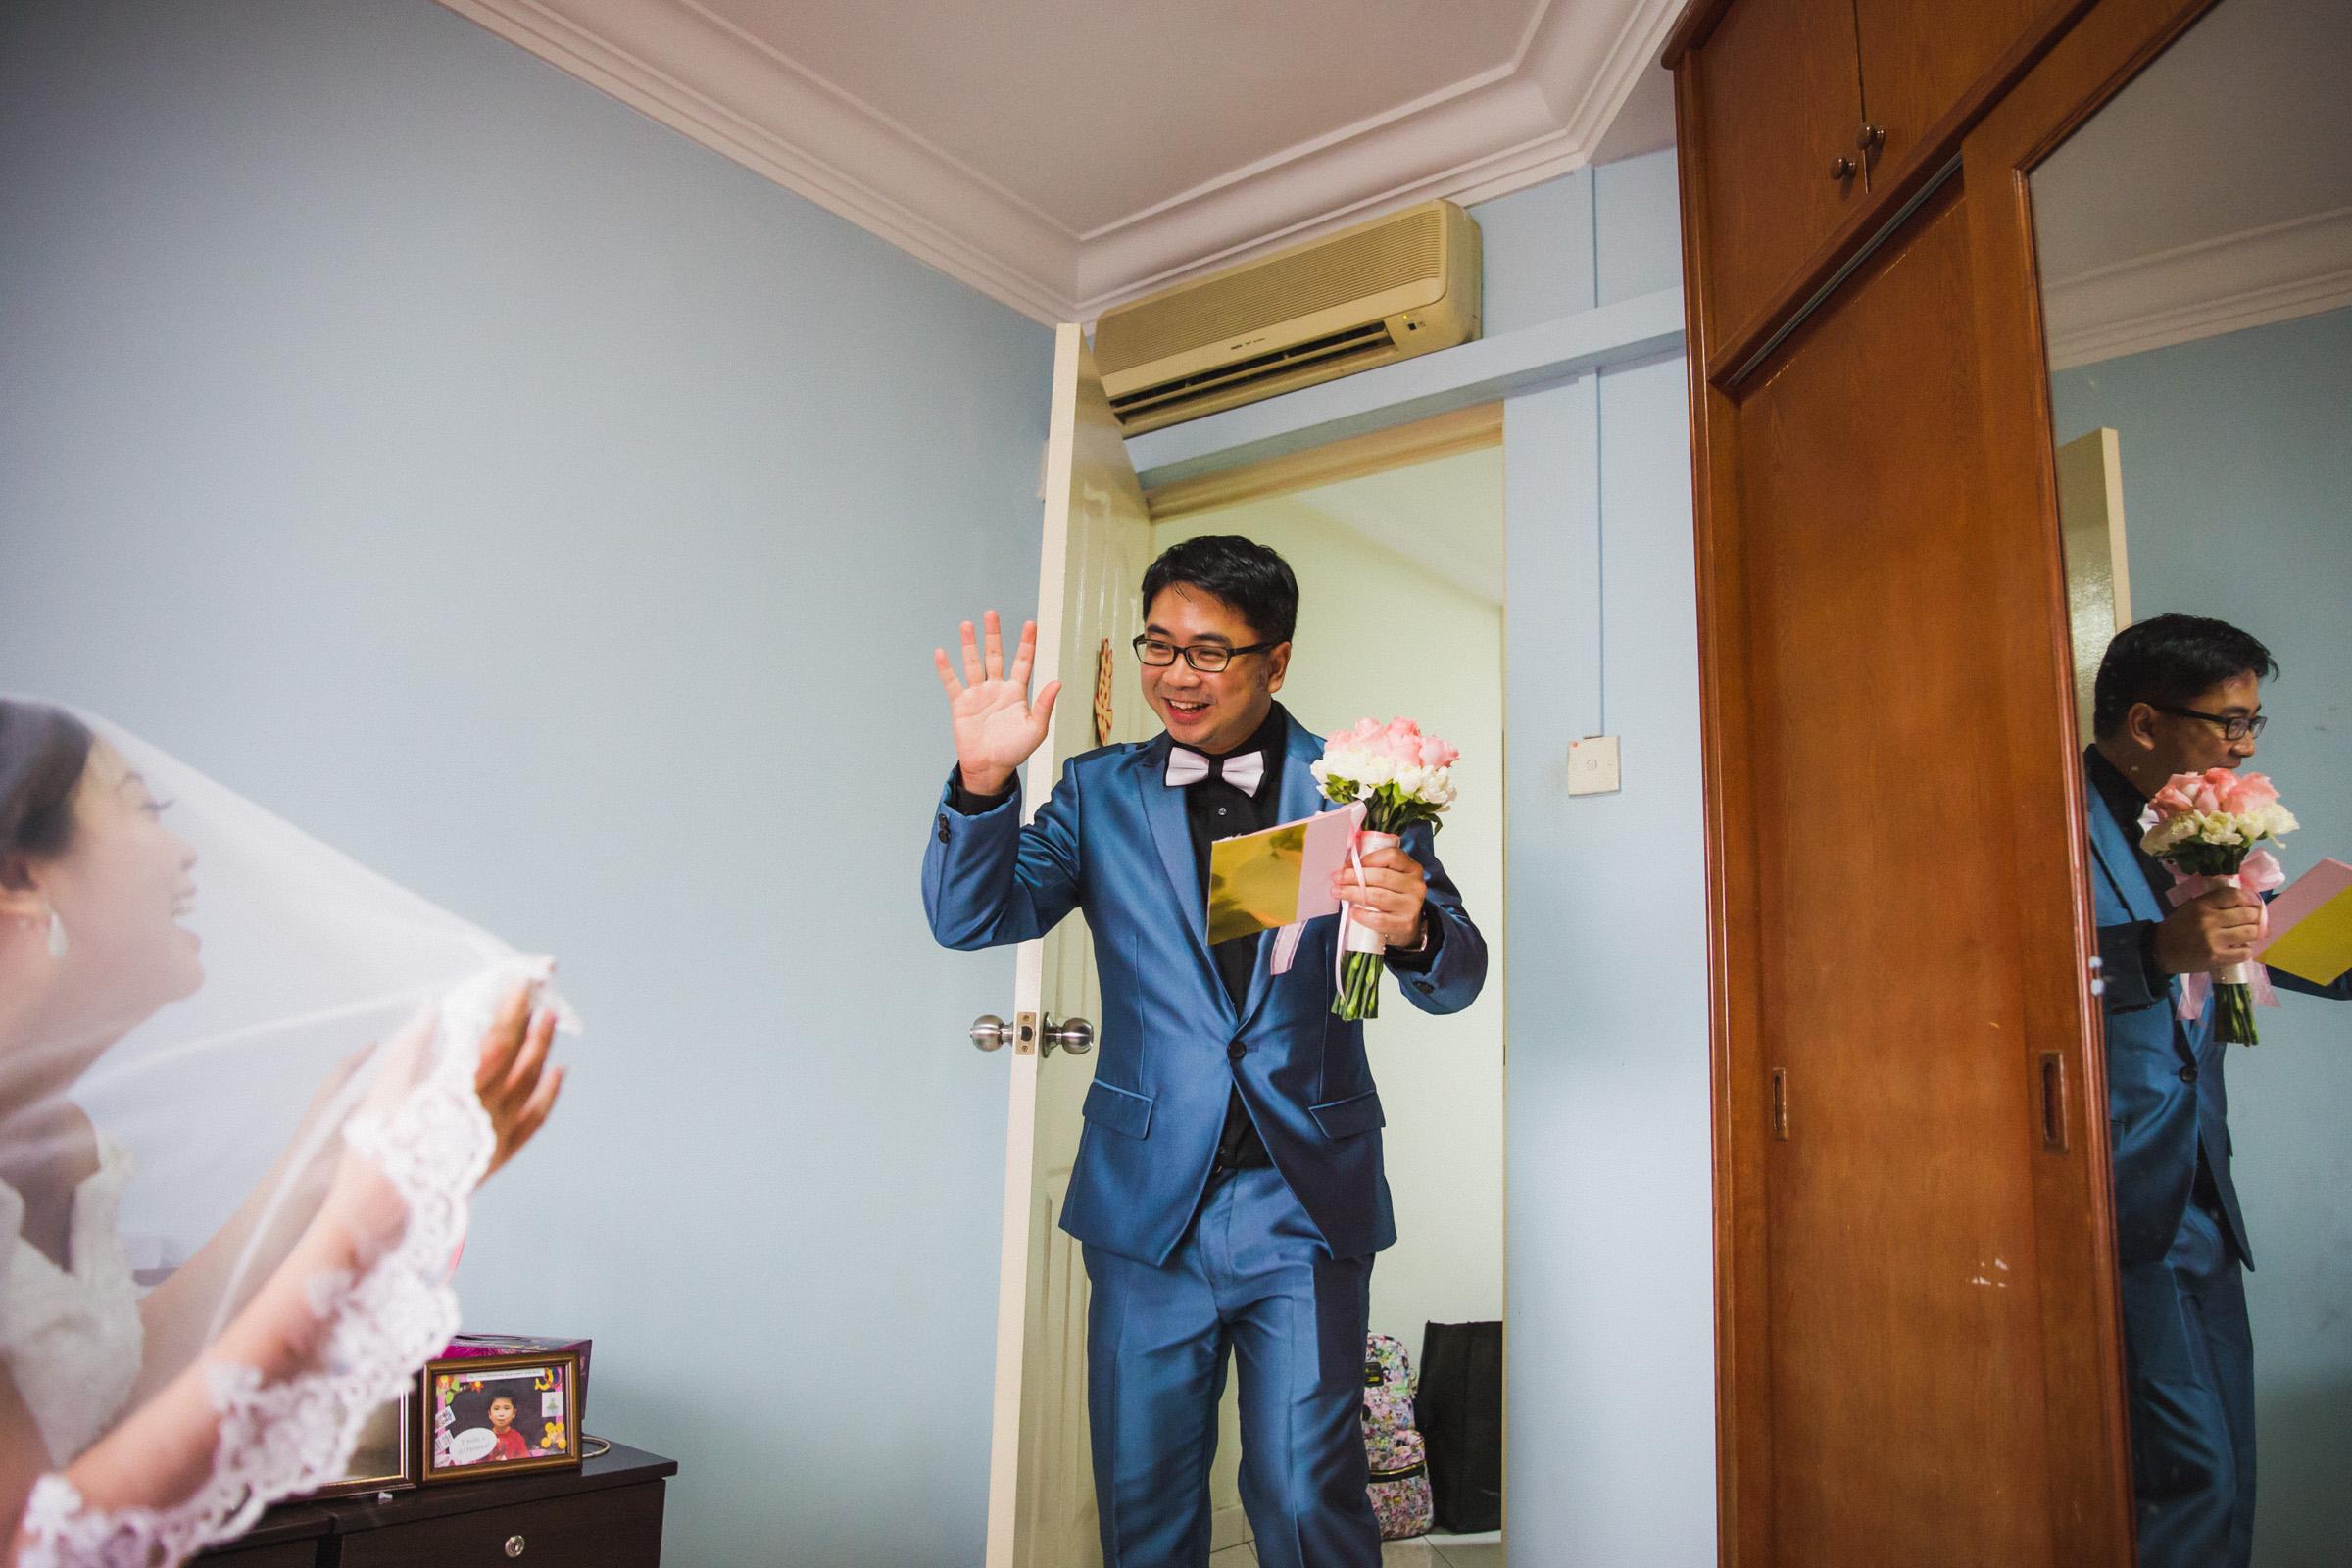 Steven_Jasmine_Wedding_Walldrobe Photography_Wedding shoots_Actual day wedding_Photographer (14)